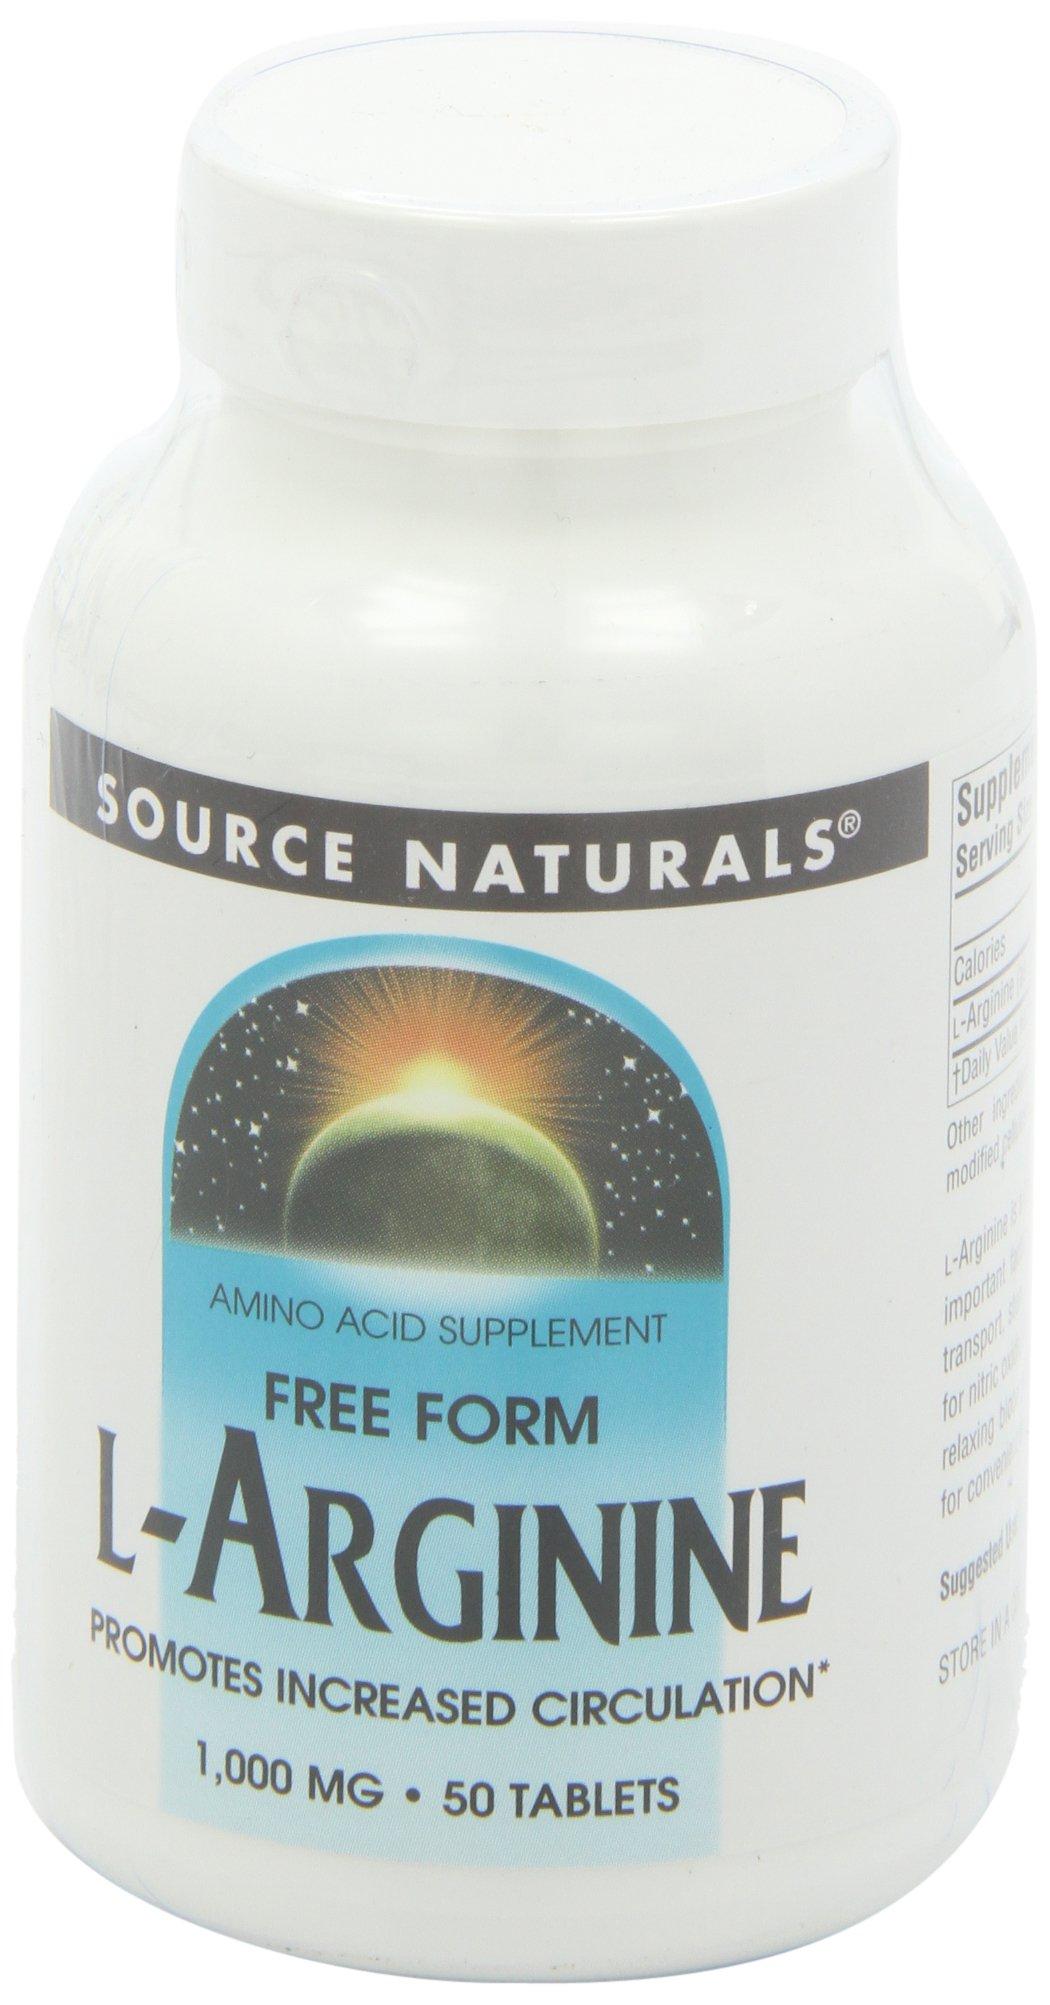 Source Naturals L-Arginine Free-Form 1000 mg, Promotes Increased Circulation, 50 Tablets